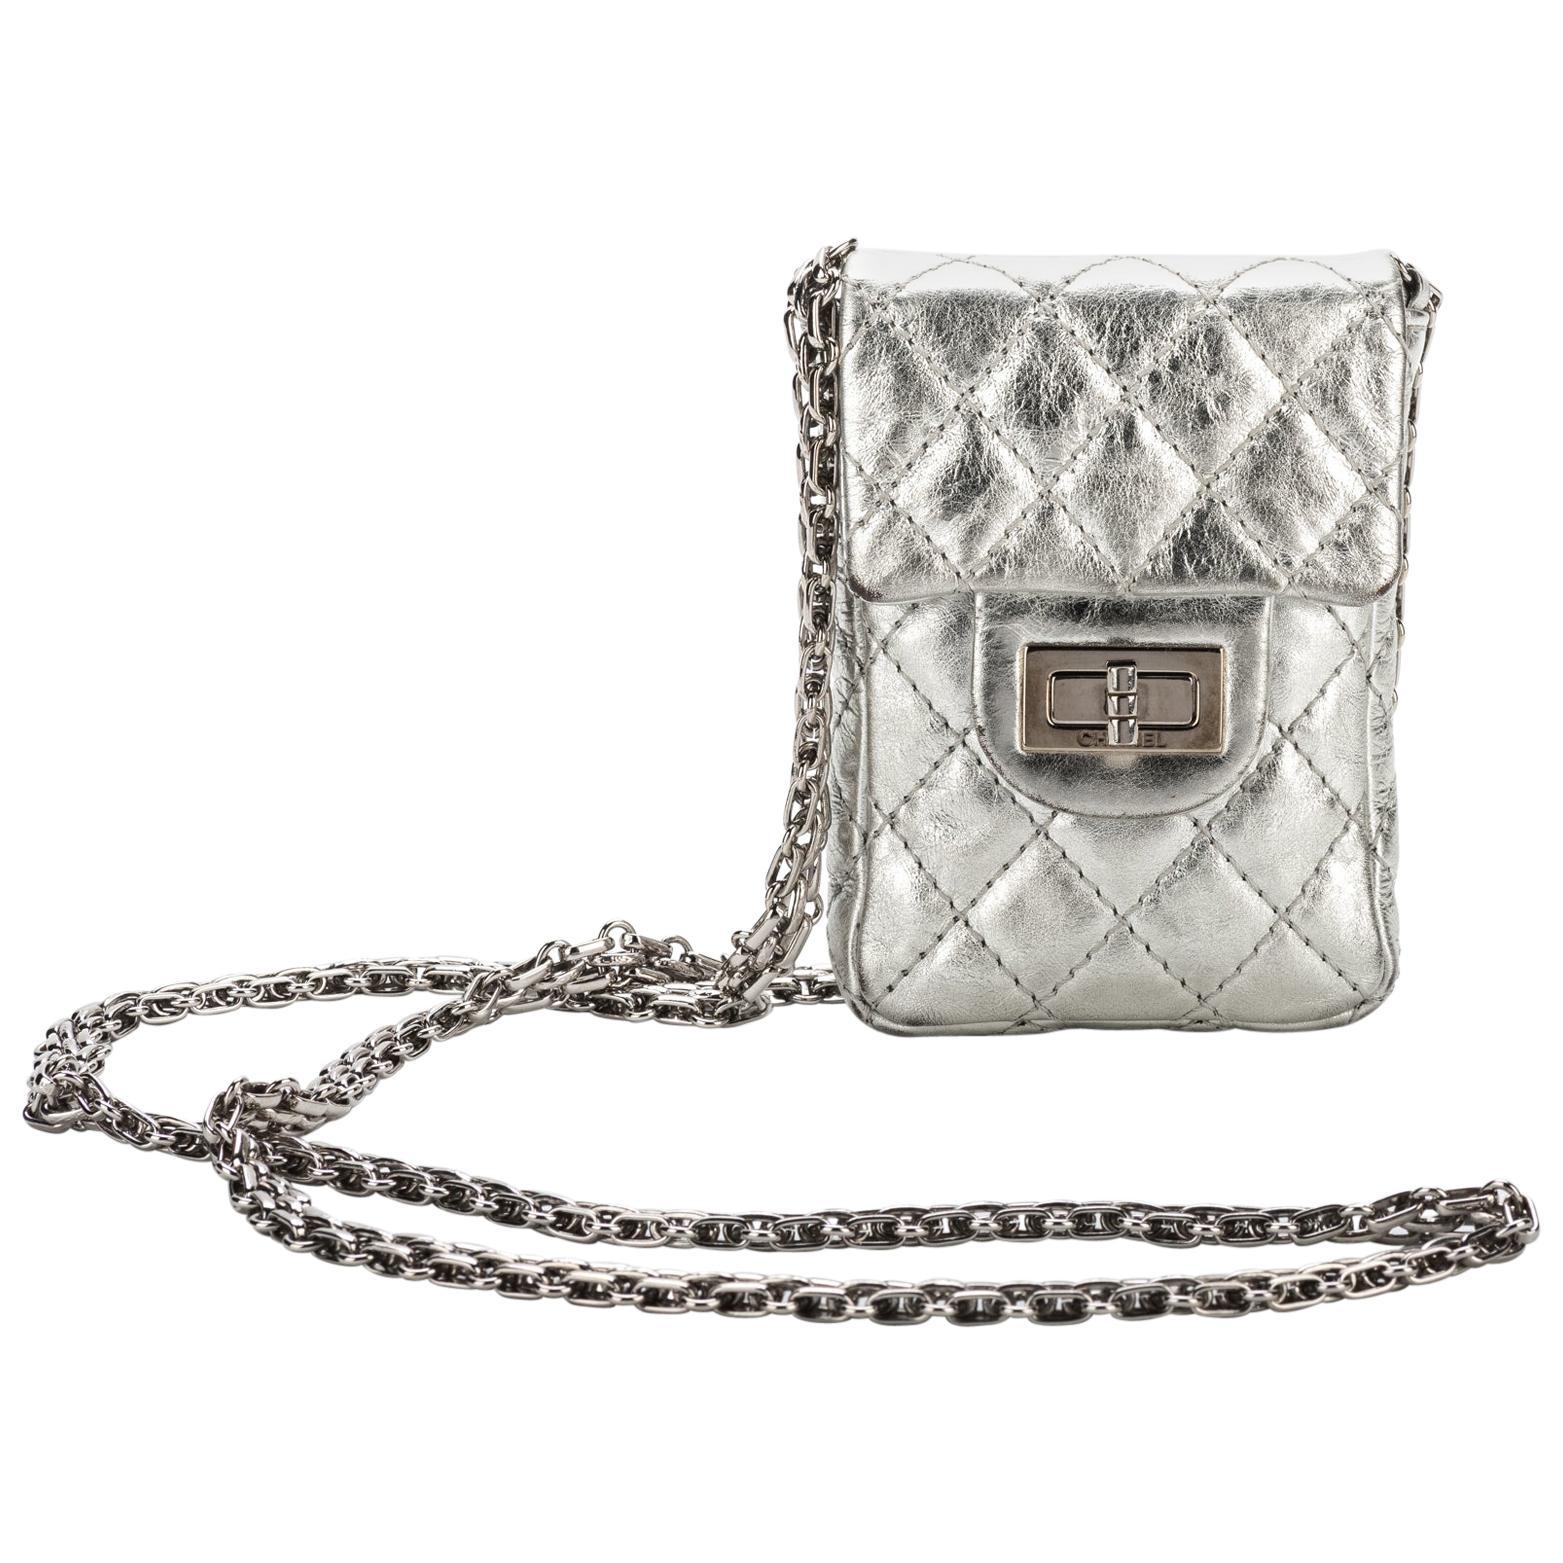 Chanel Silver Mini Reissue Crossbody Bag